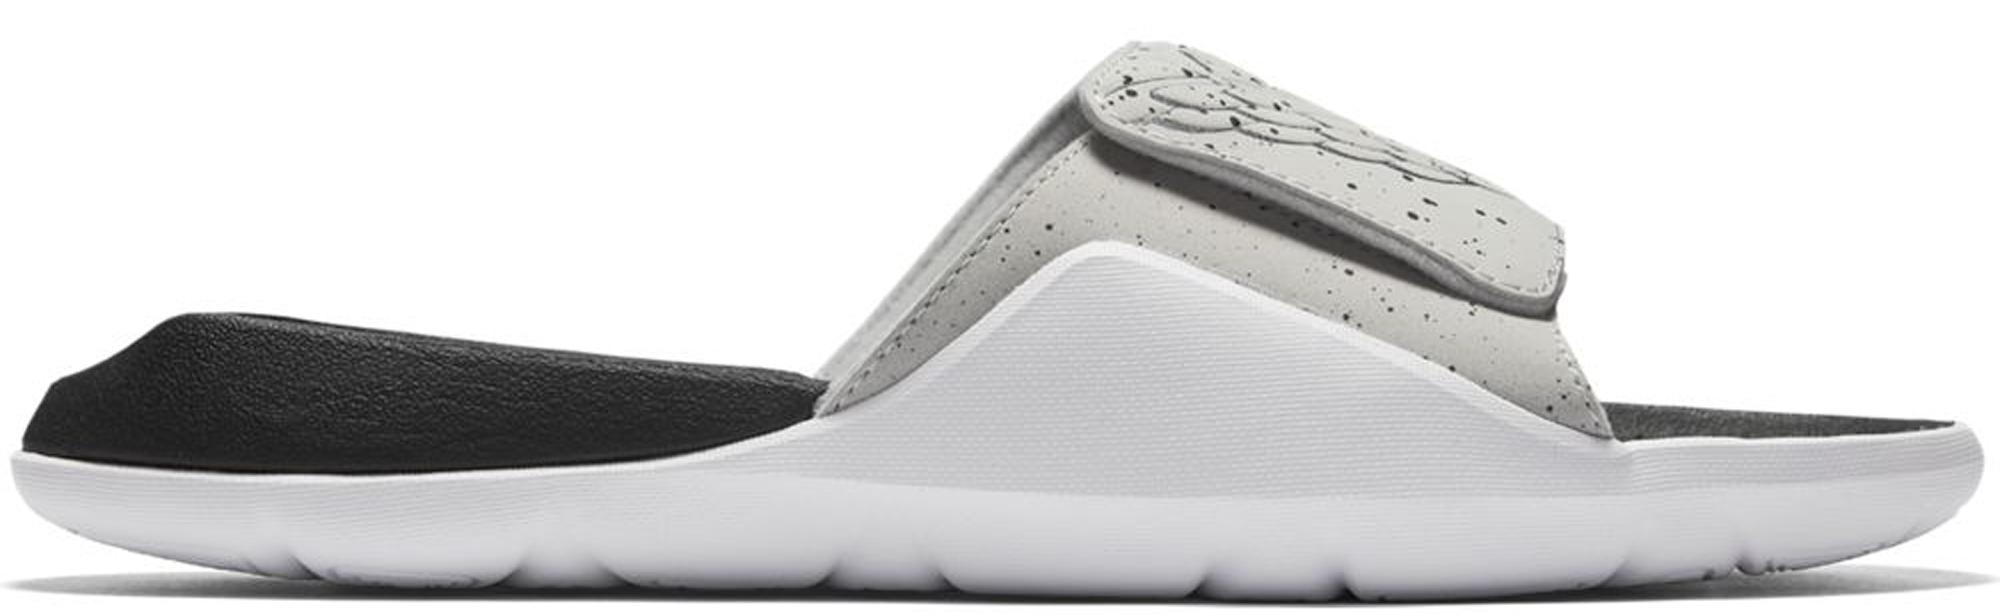 Jordan Hydro 7 White Cement - AA2517-004